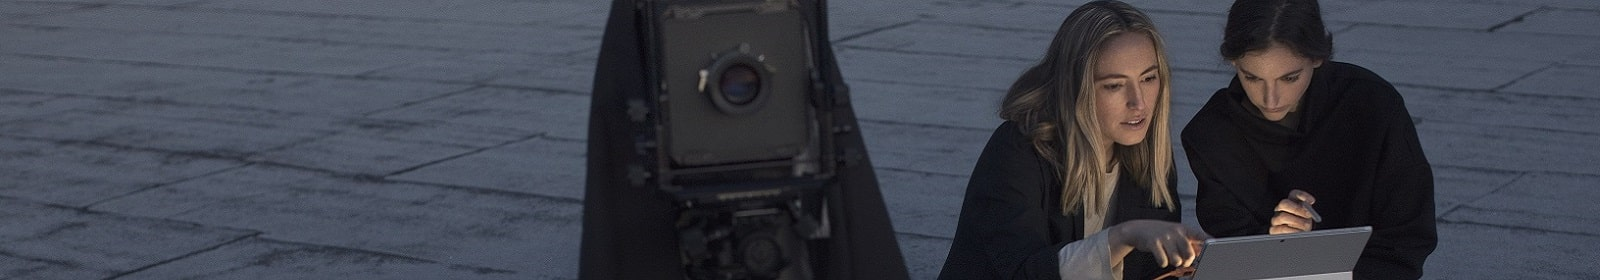 Two women set up a camera